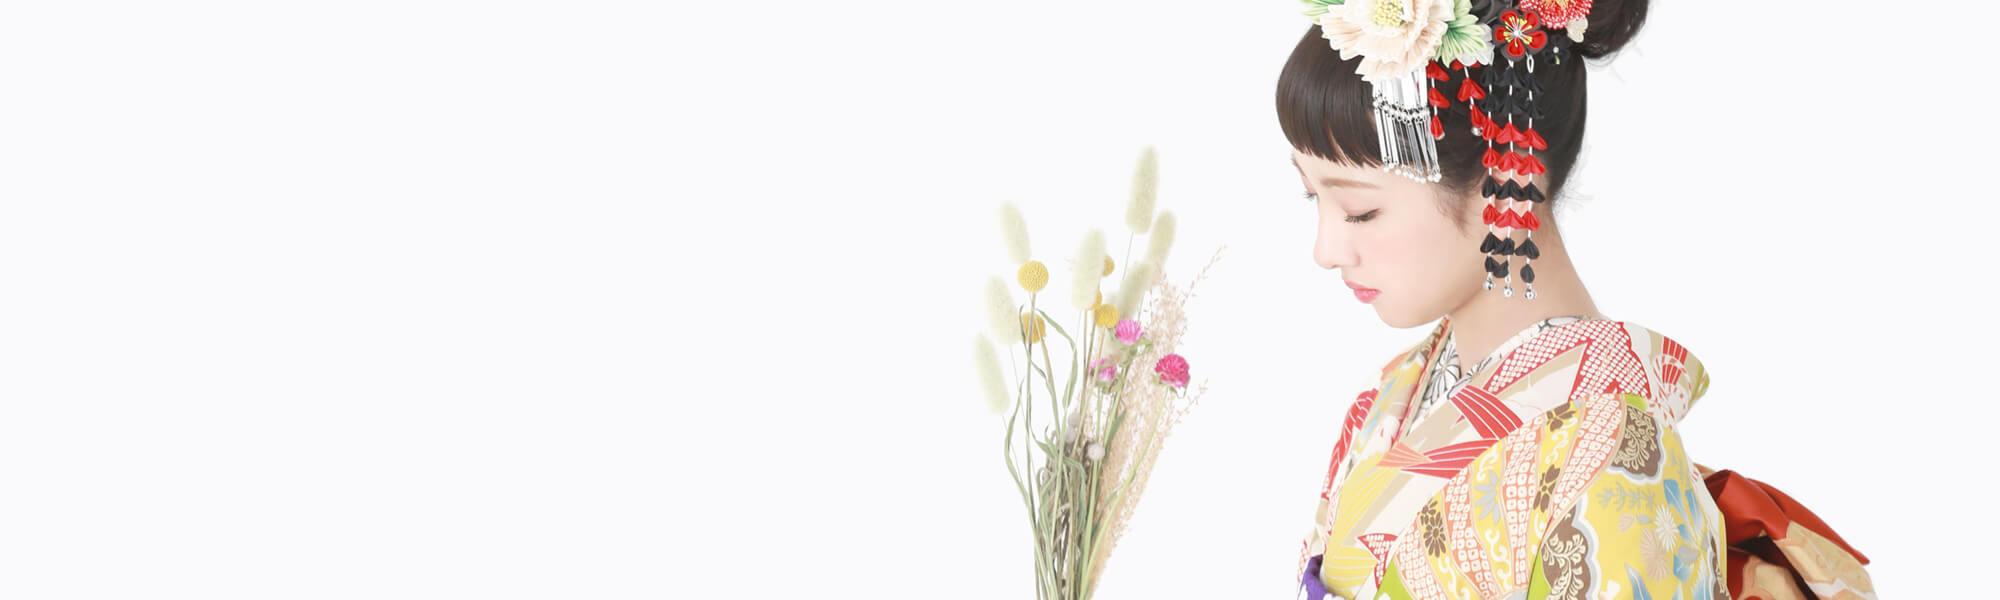 5663d62f873c1 結婚式・成人式・卒業式の着物レンタルなら、京都着物レンタル夢館